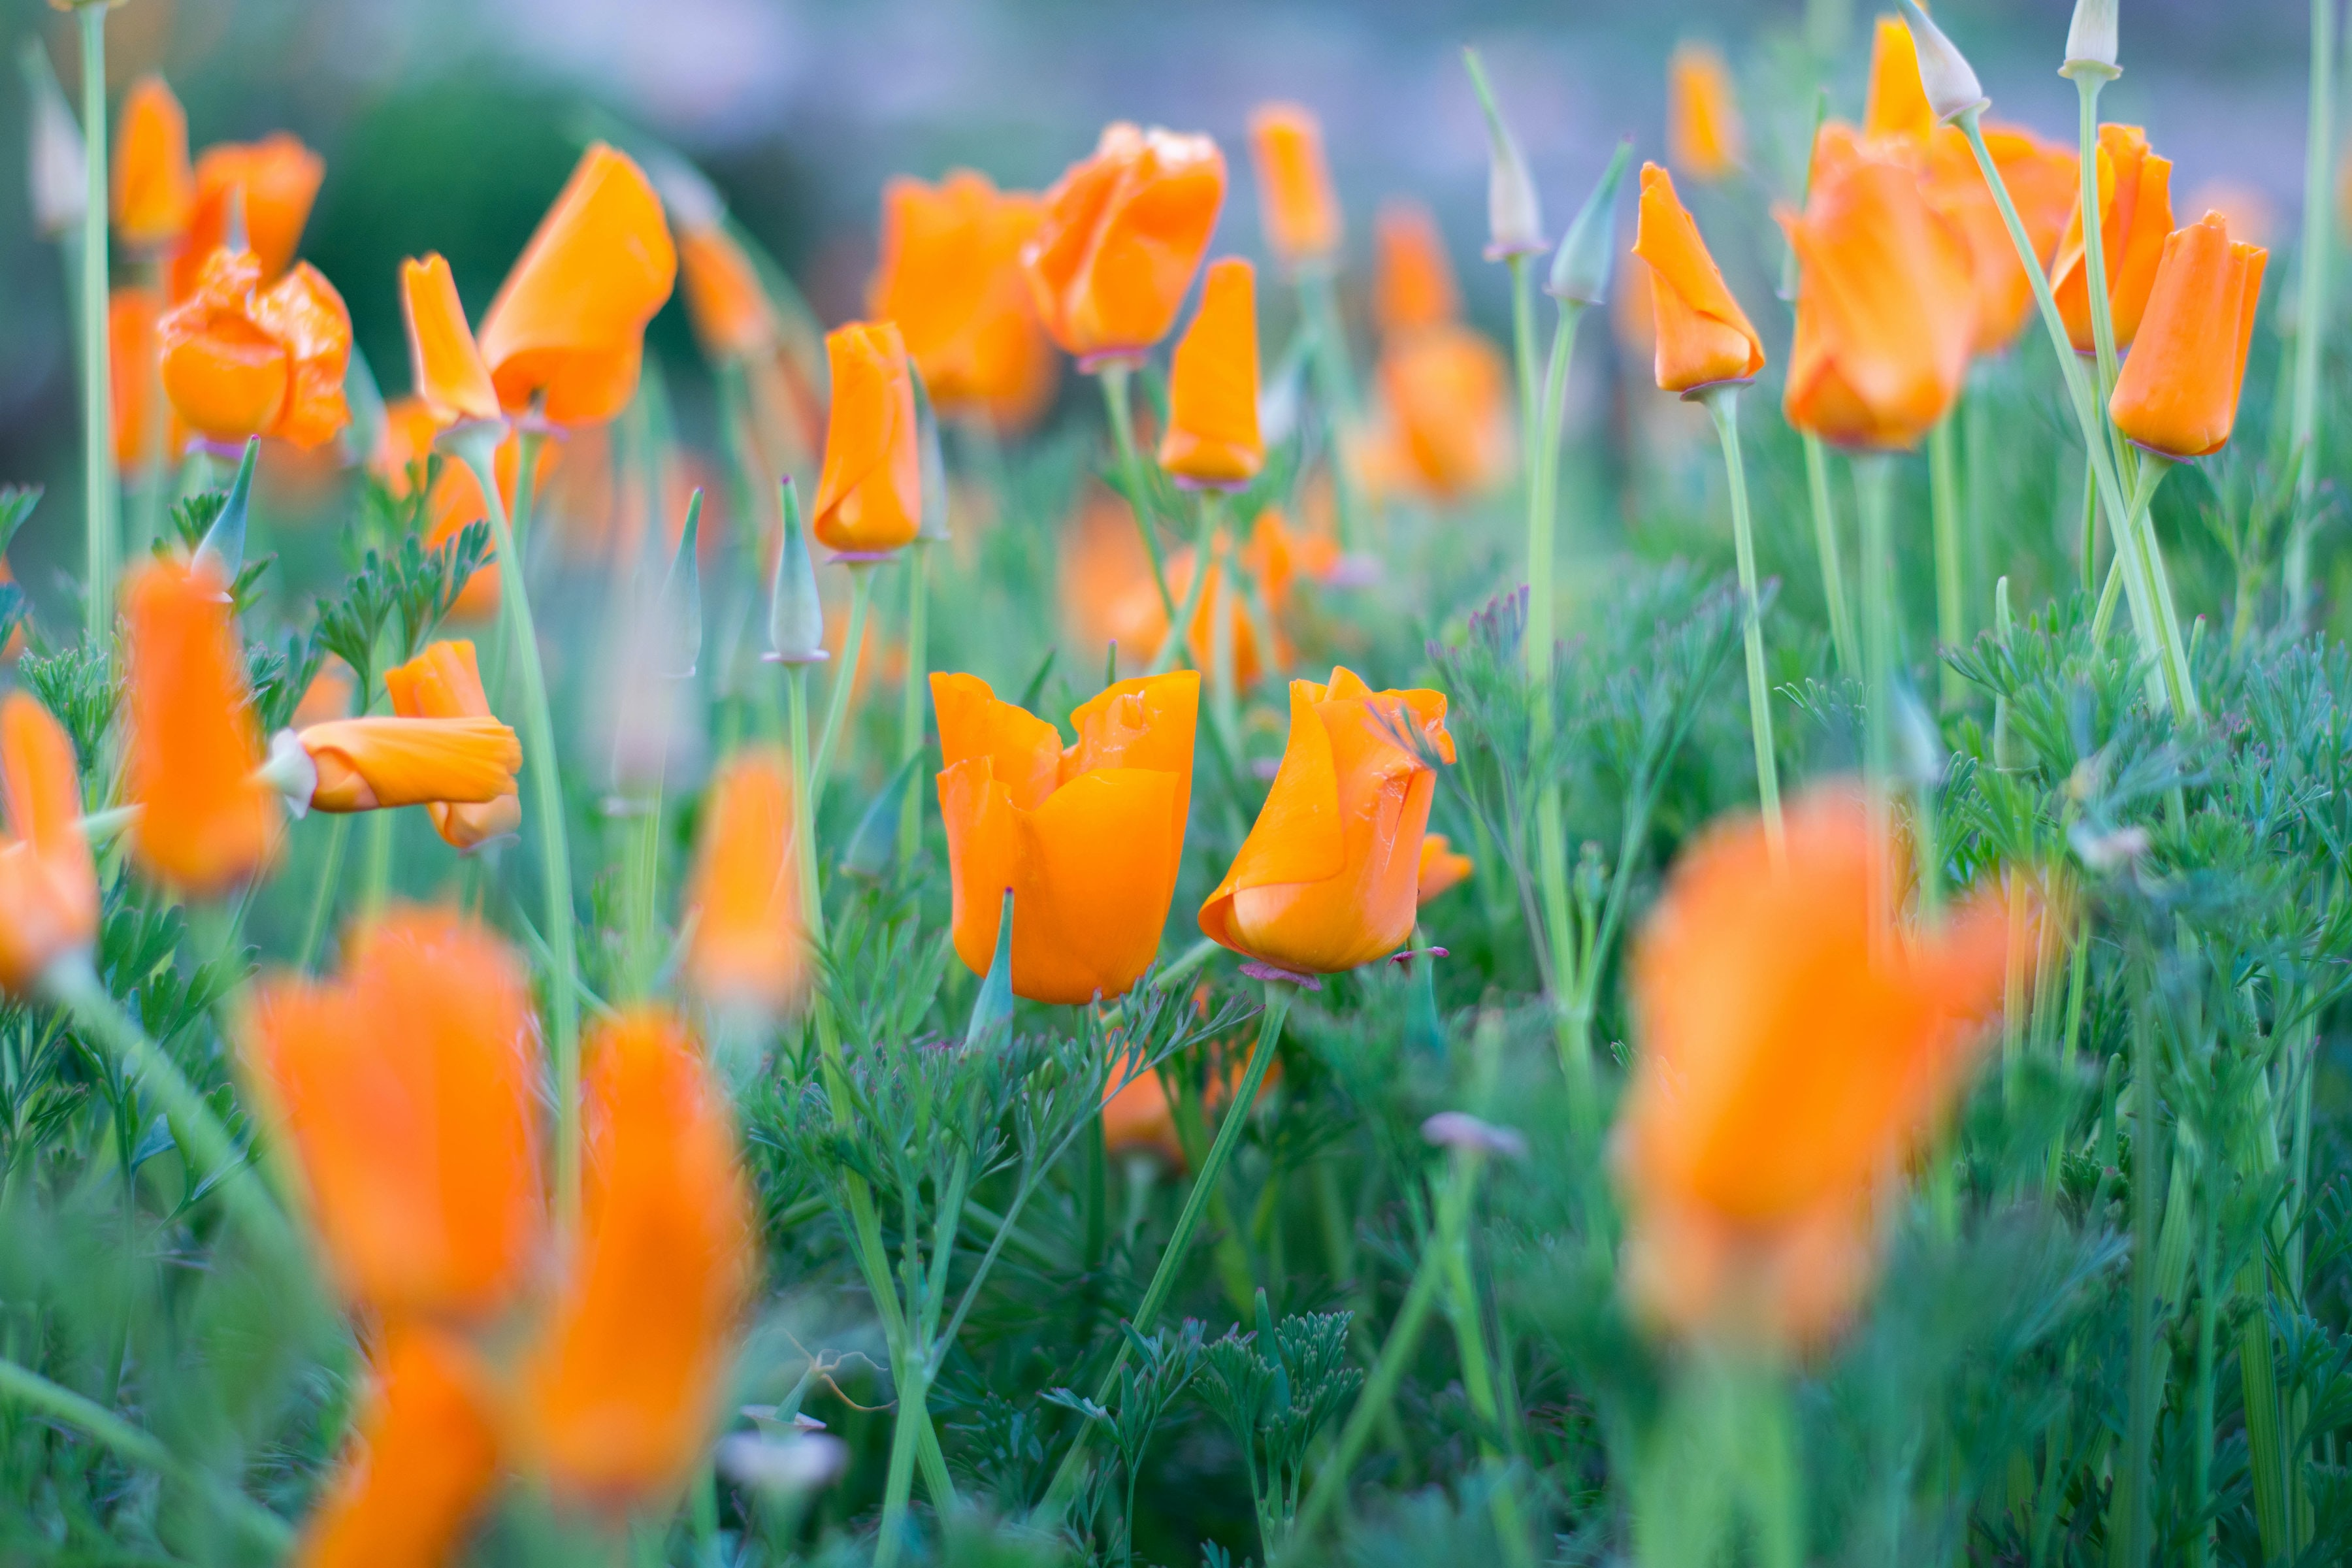 shallow focus photography of orange tulips